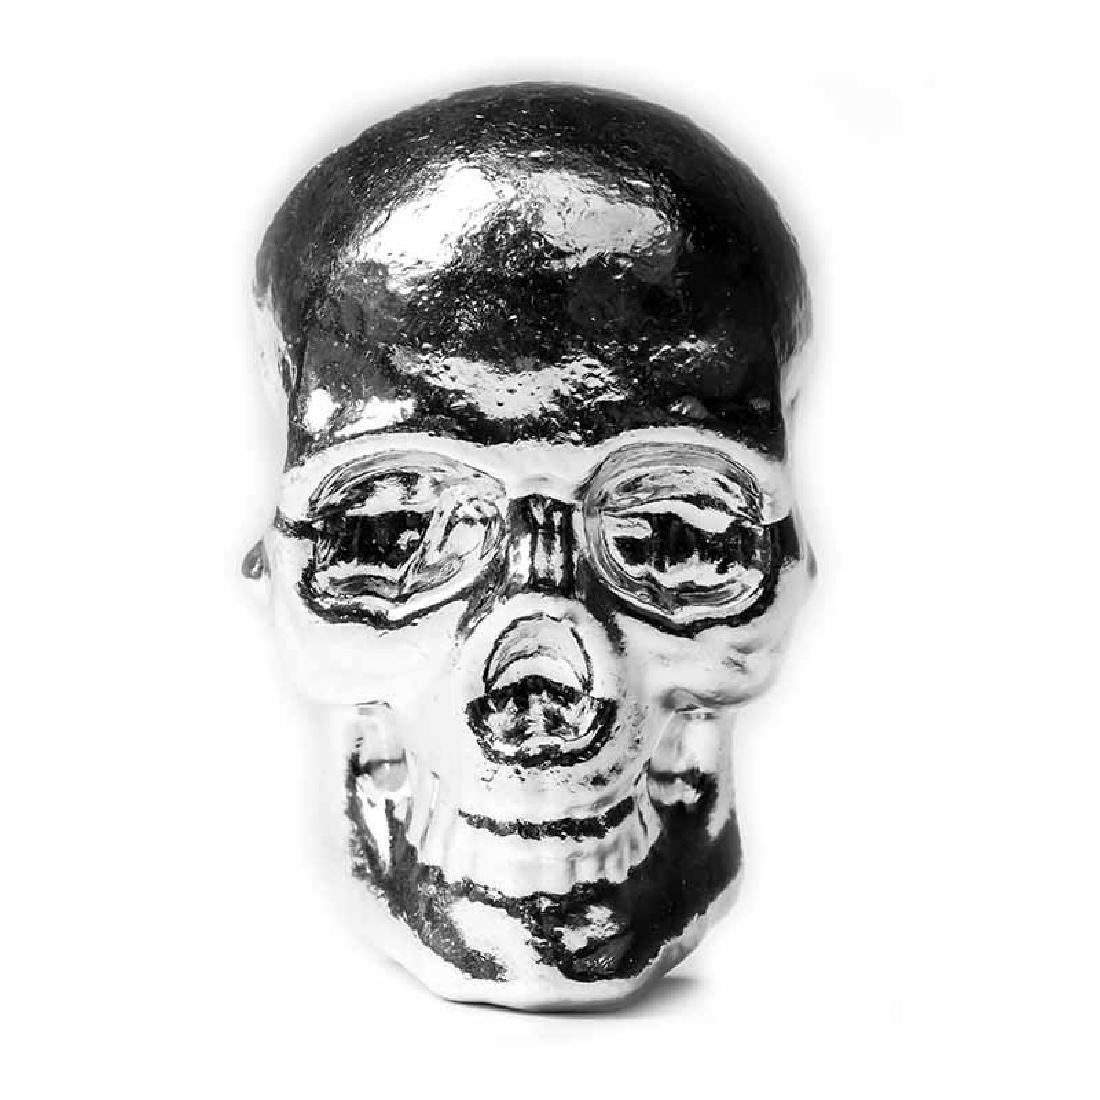 10 oz Atlantis Mint Hand Poured .999 Silver Skull